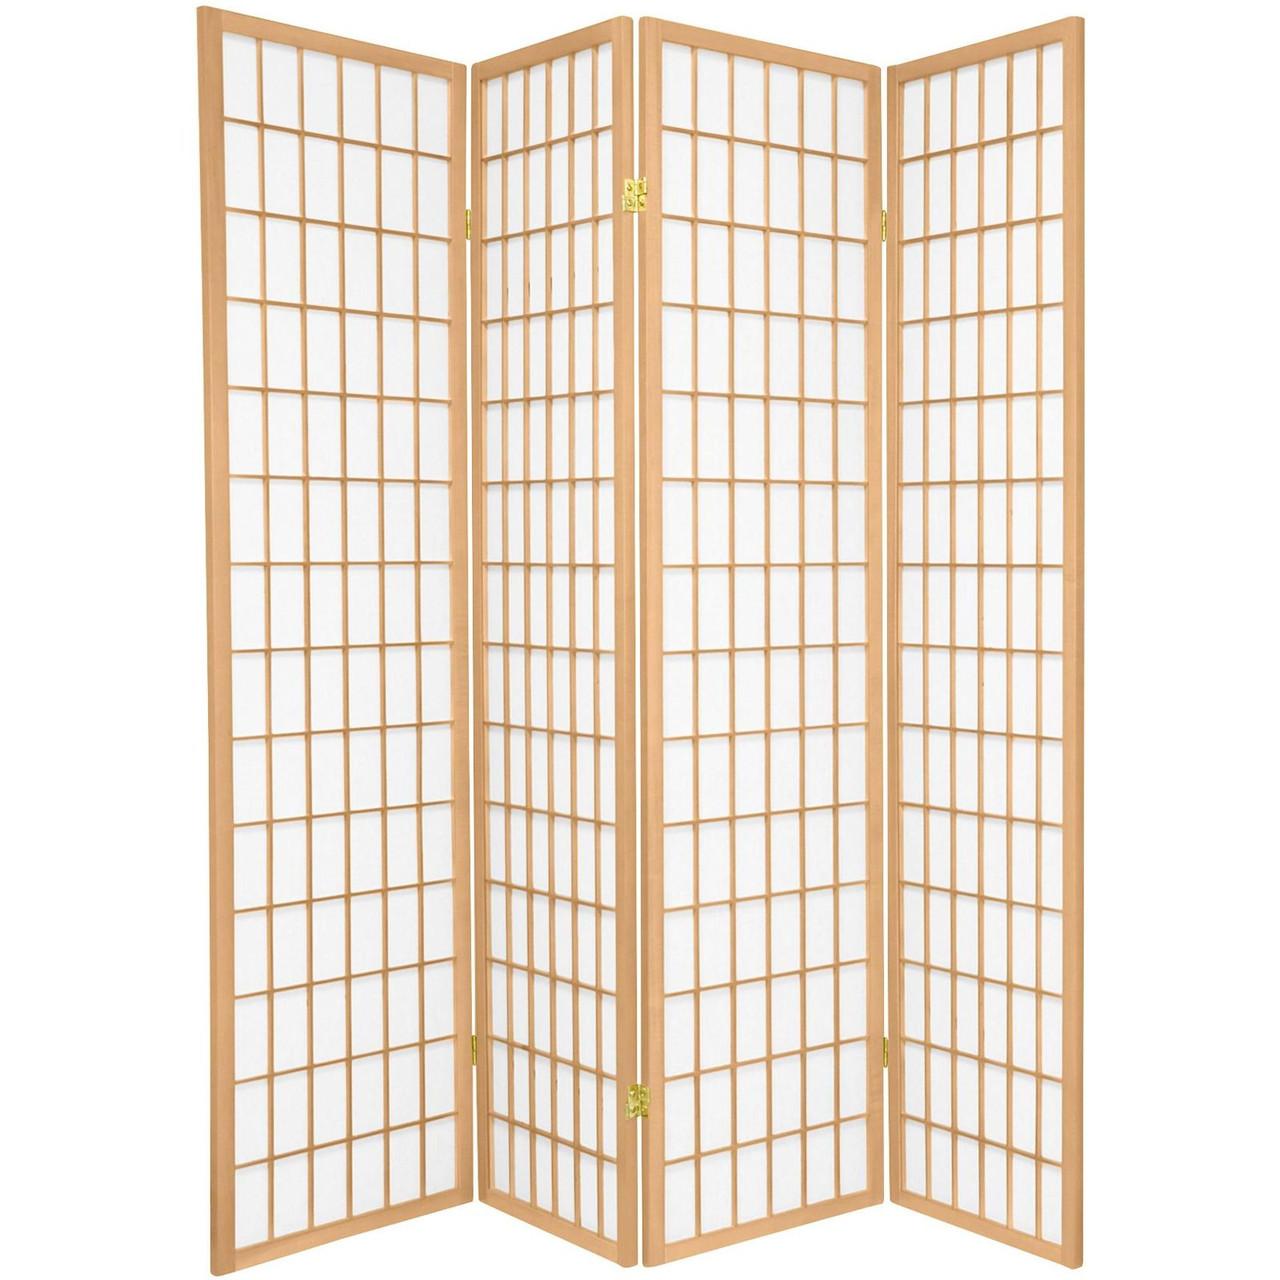 4 Panel Room Dividers Shoji Design Black, White, Cherry, Espresso, or Natural Color